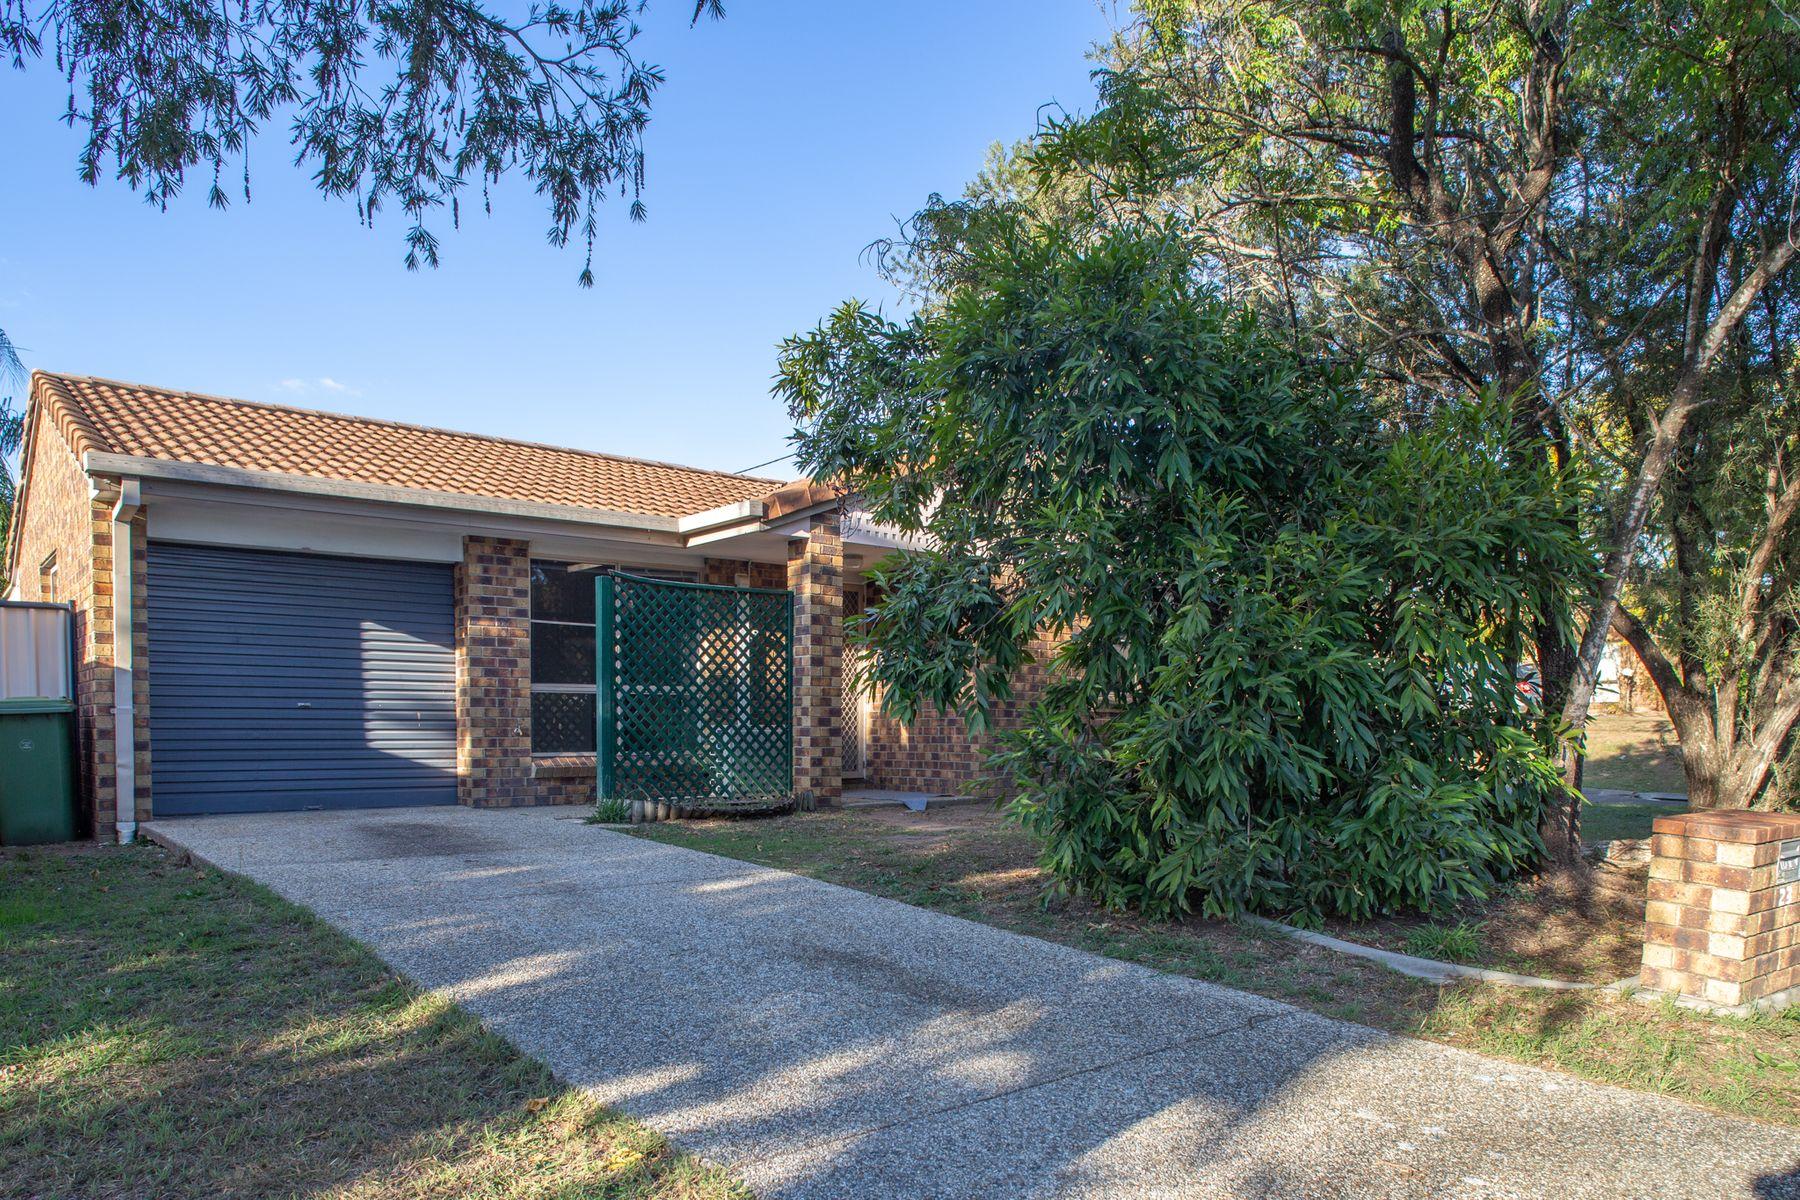 23 Bottlebrush Crescent, Redbank Plains, QLD 4301